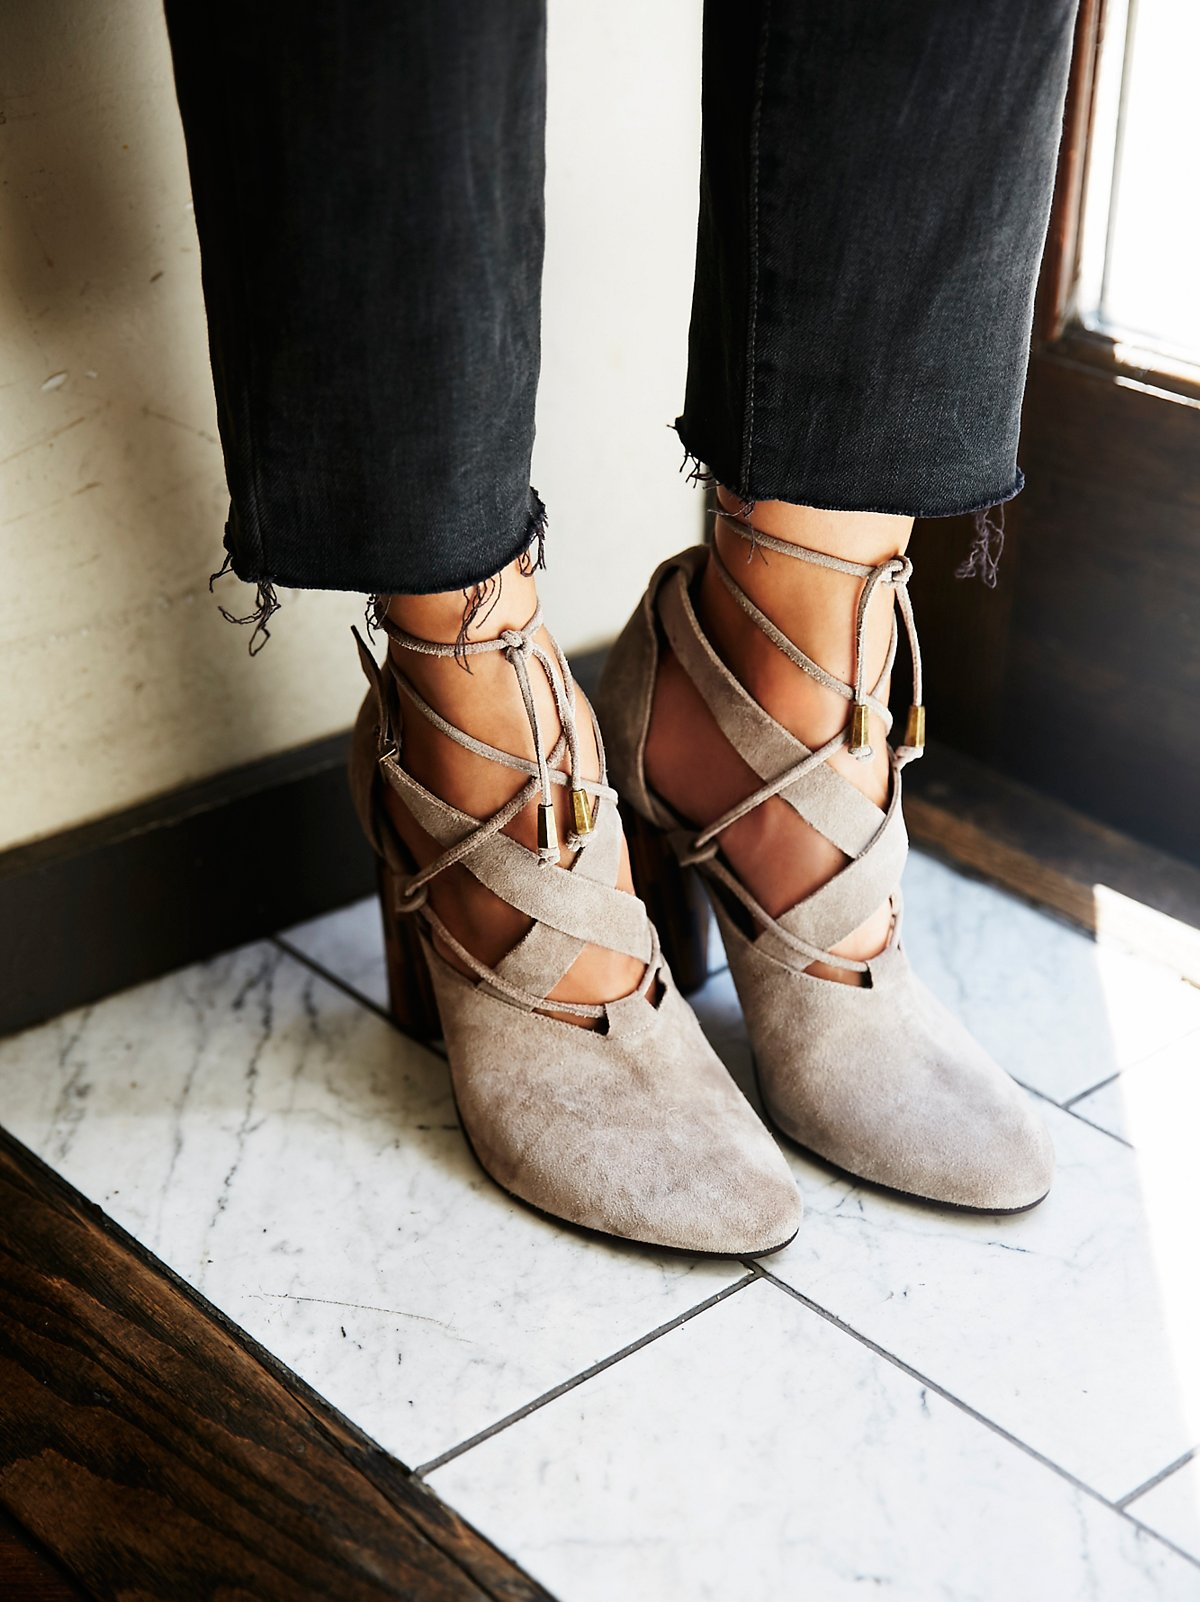 Nouvella裹踝高跟鞋